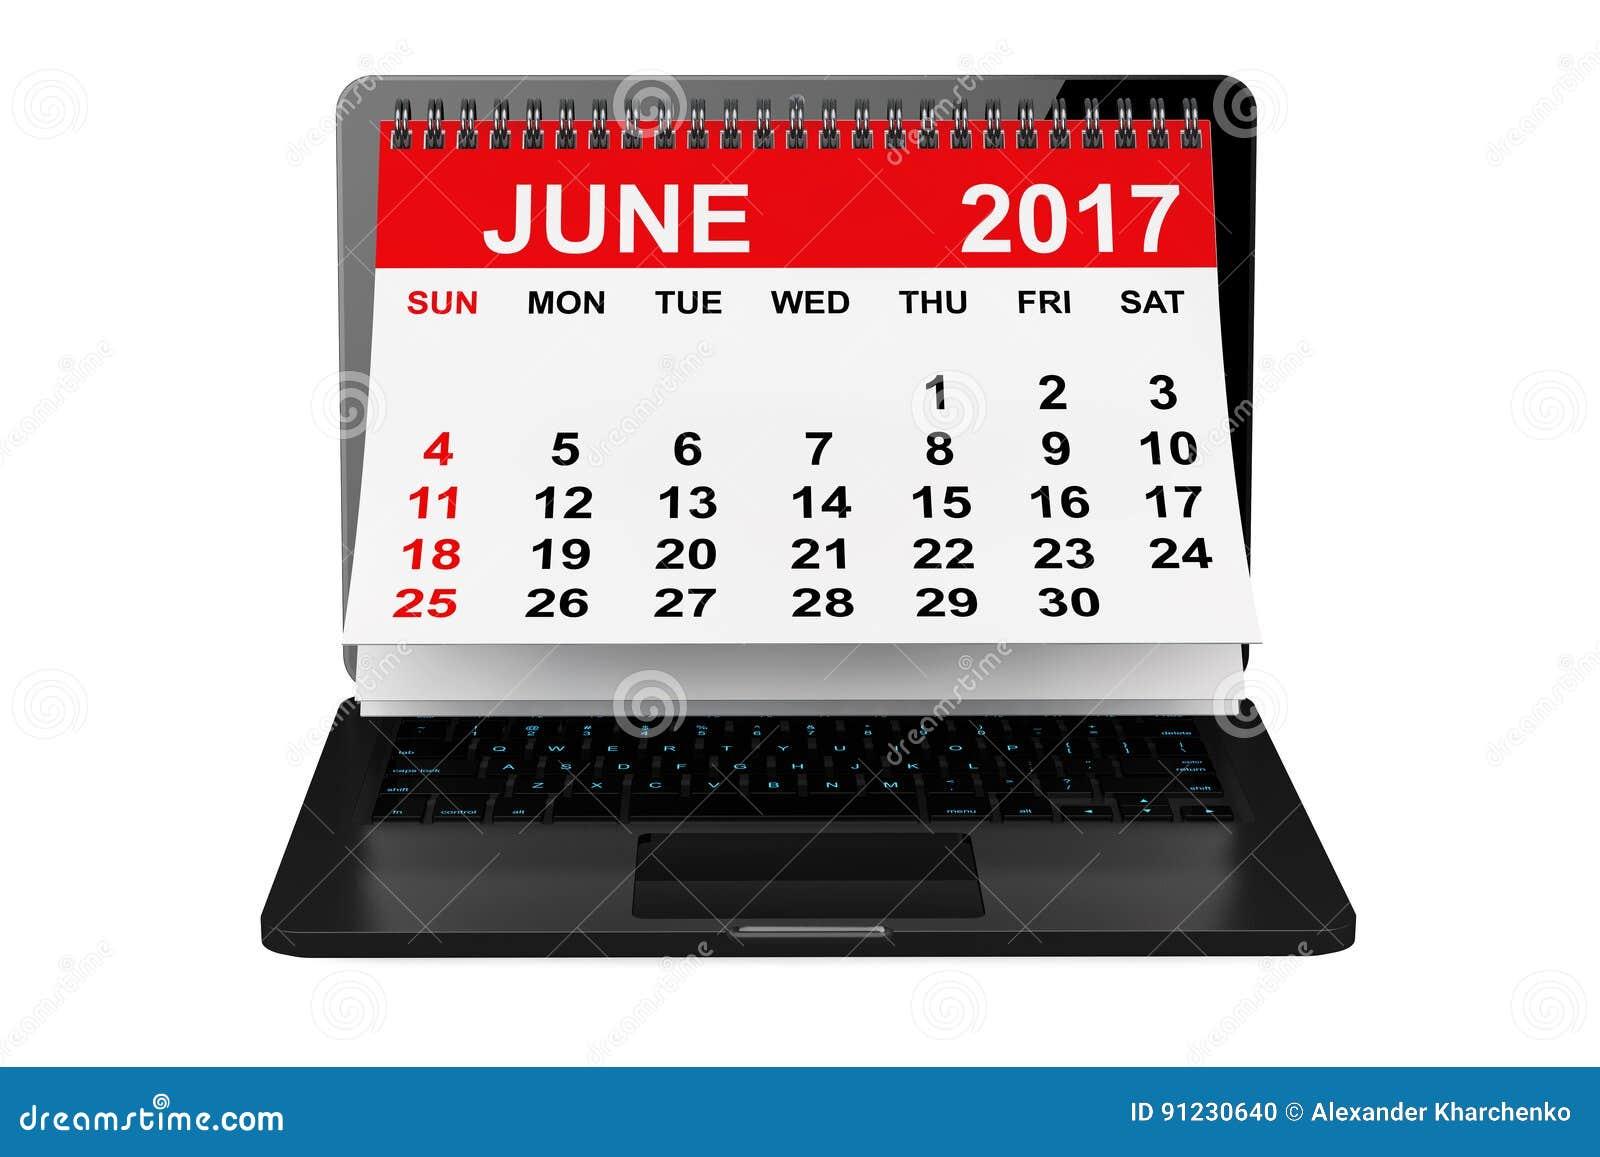 juin 2017 calendrier au dessus d 39 cran d 39 ordinateur portable rendu 3d illustration stock image. Black Bedroom Furniture Sets. Home Design Ideas